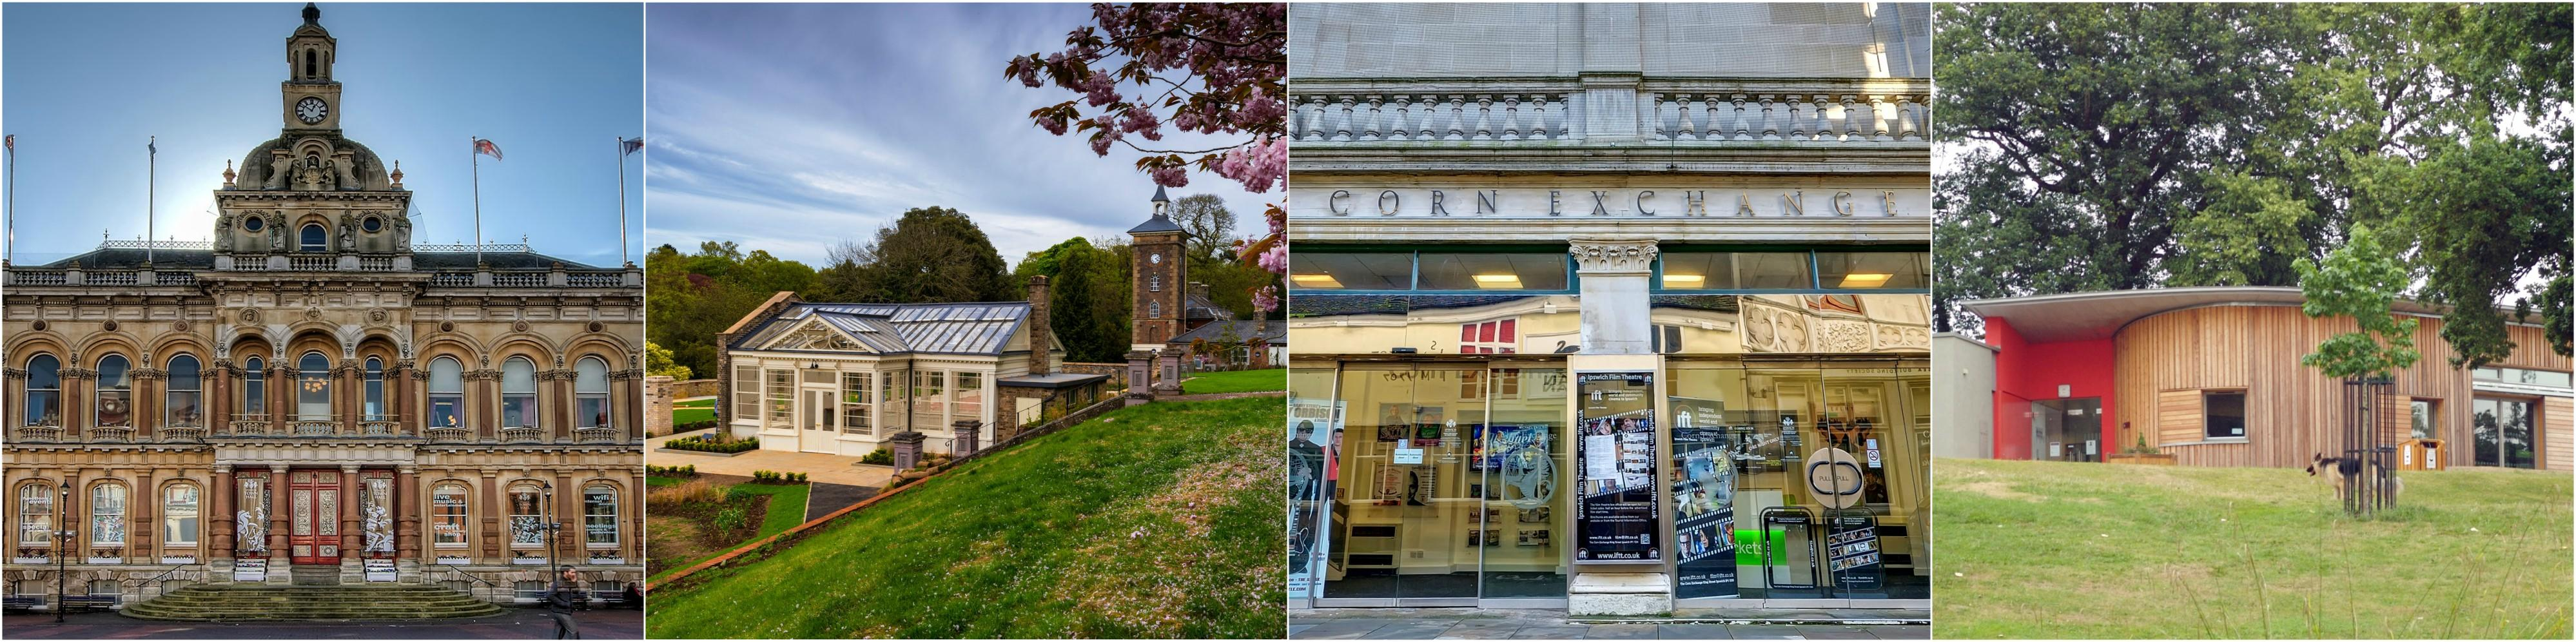 Ipswich Town Hall, Holywells Orangery, Corn Exchange and Reg Driver Centre